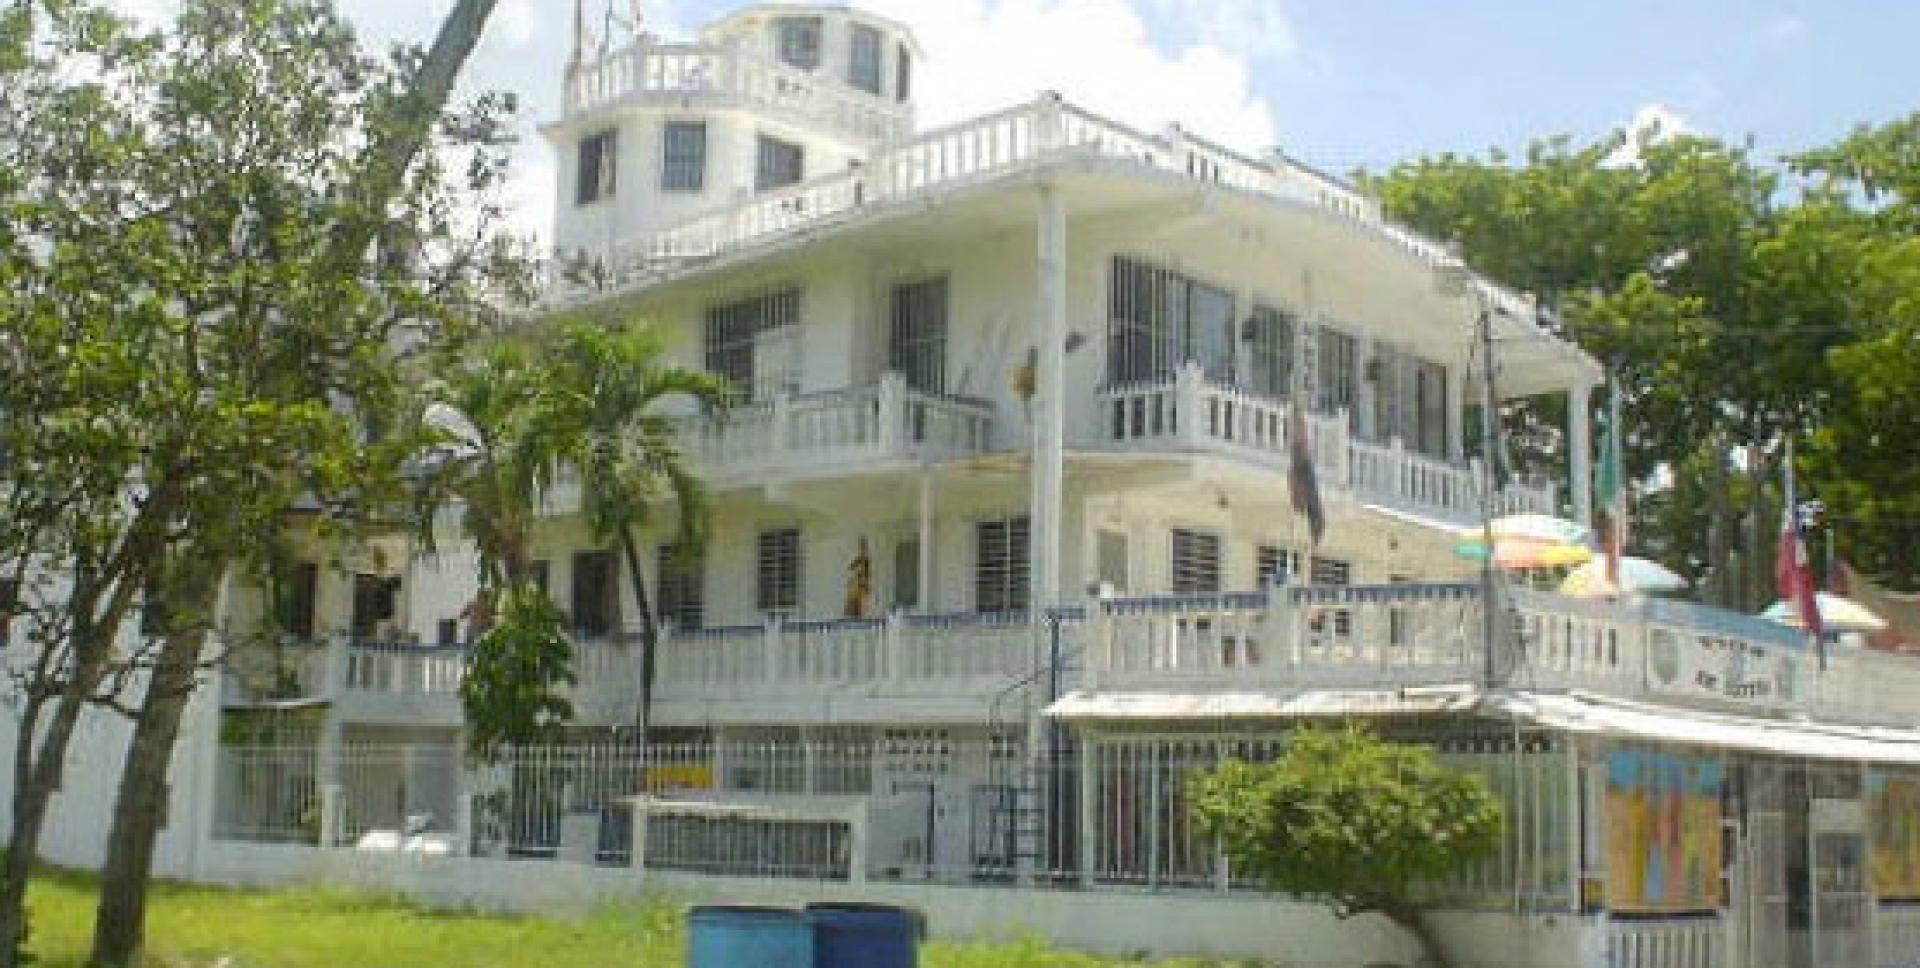 Hotel Fior di Loto – Juan Dolio